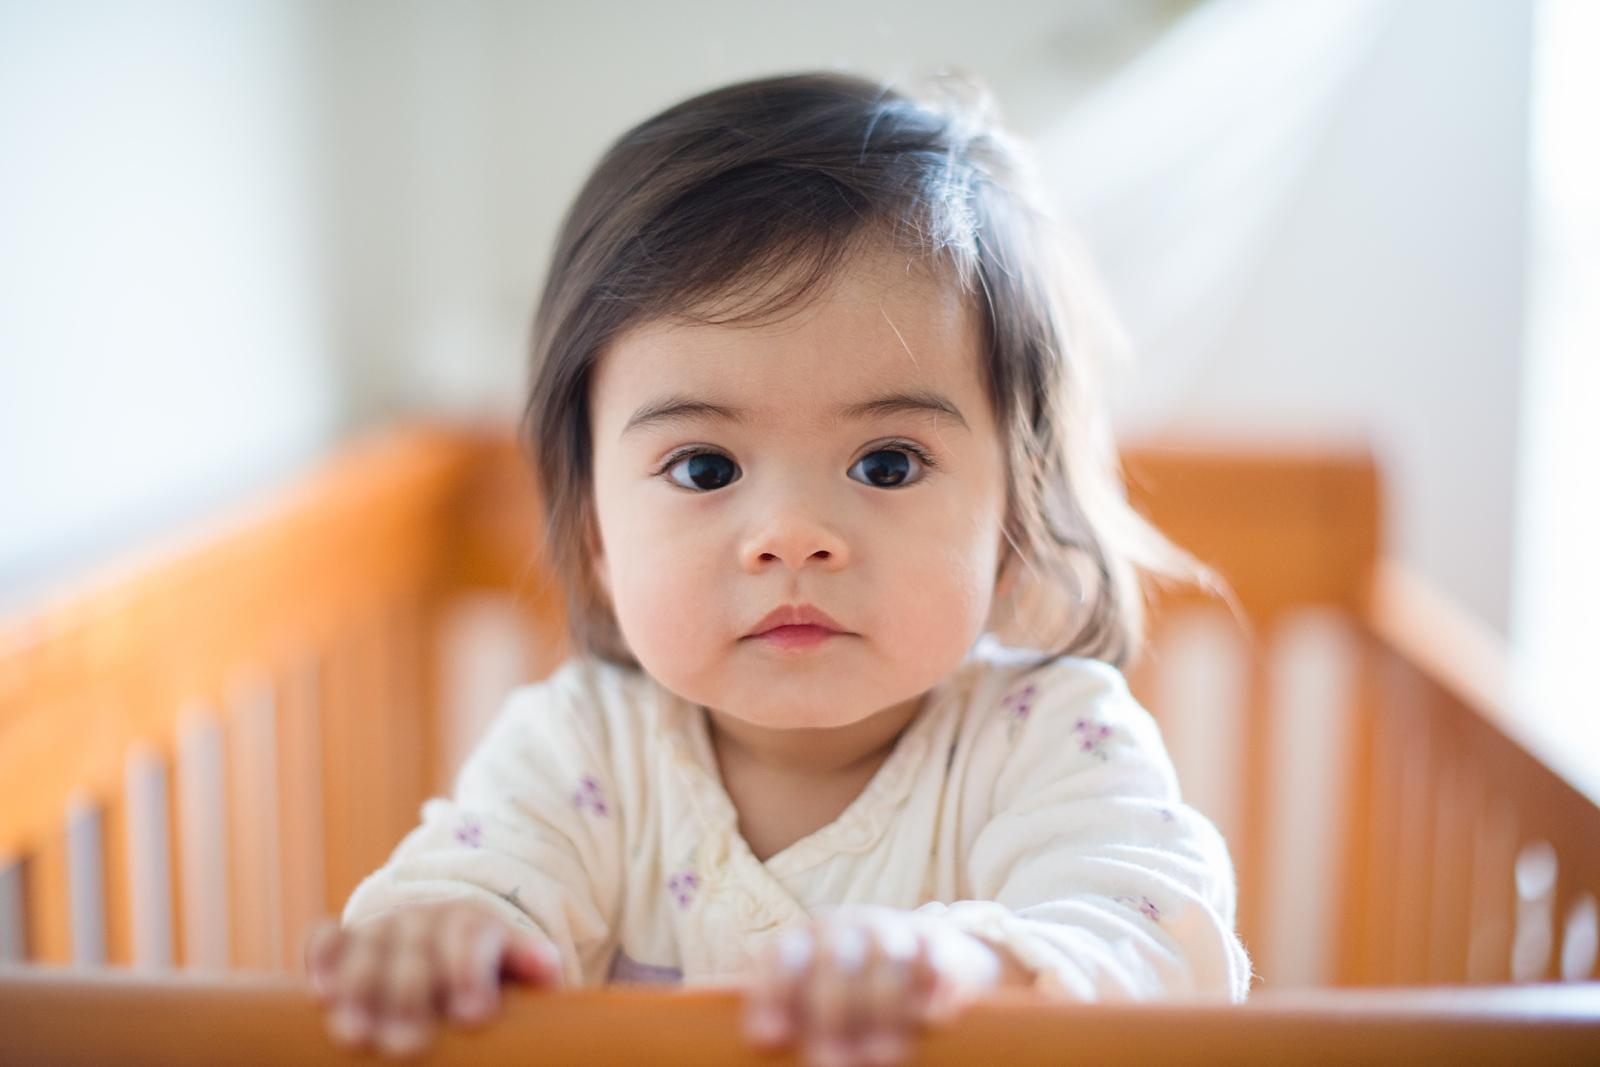 20130814-Amelia Stands in Crib-BLOGGrid_0012.jpg